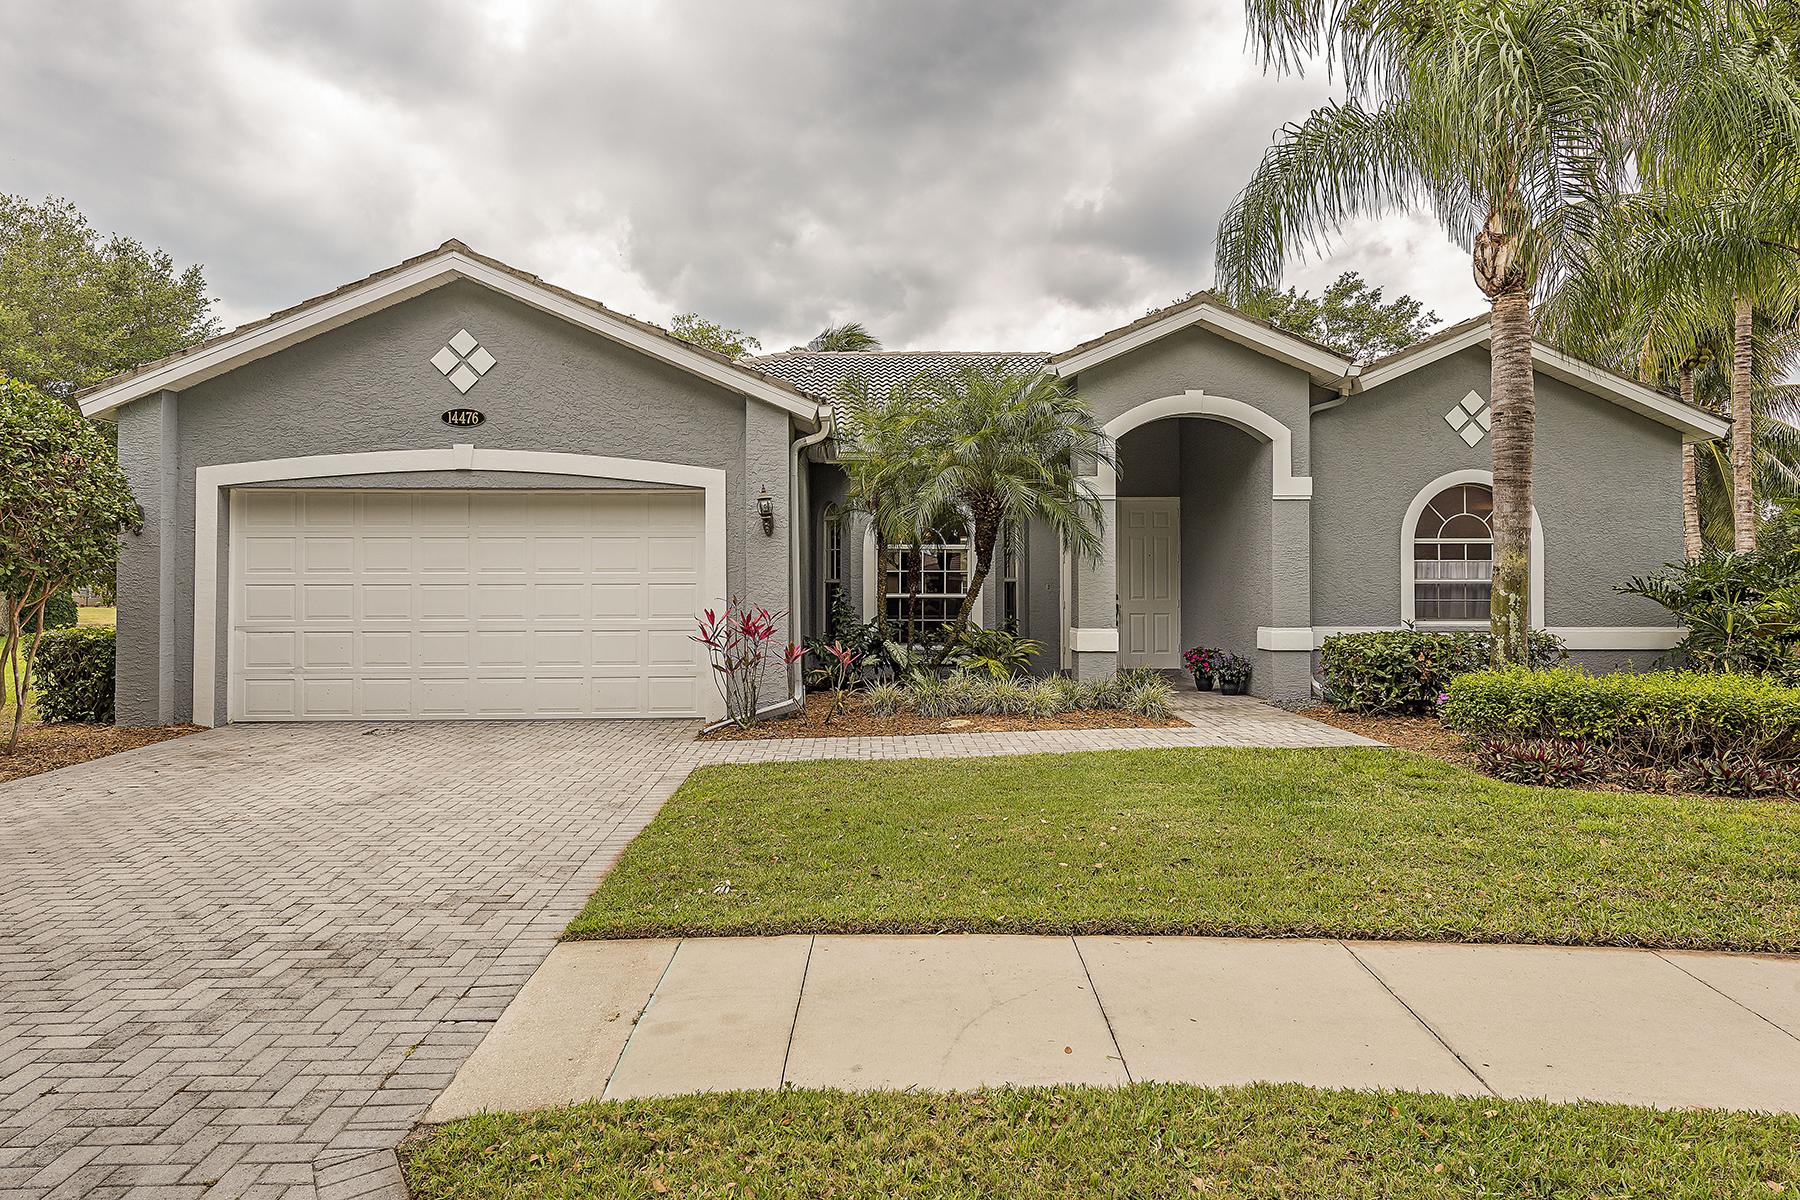 Single Family Home for Sale at INDIGO LAKES 14476 Jekyll Island Ct Naples, Florida, 34119 United States